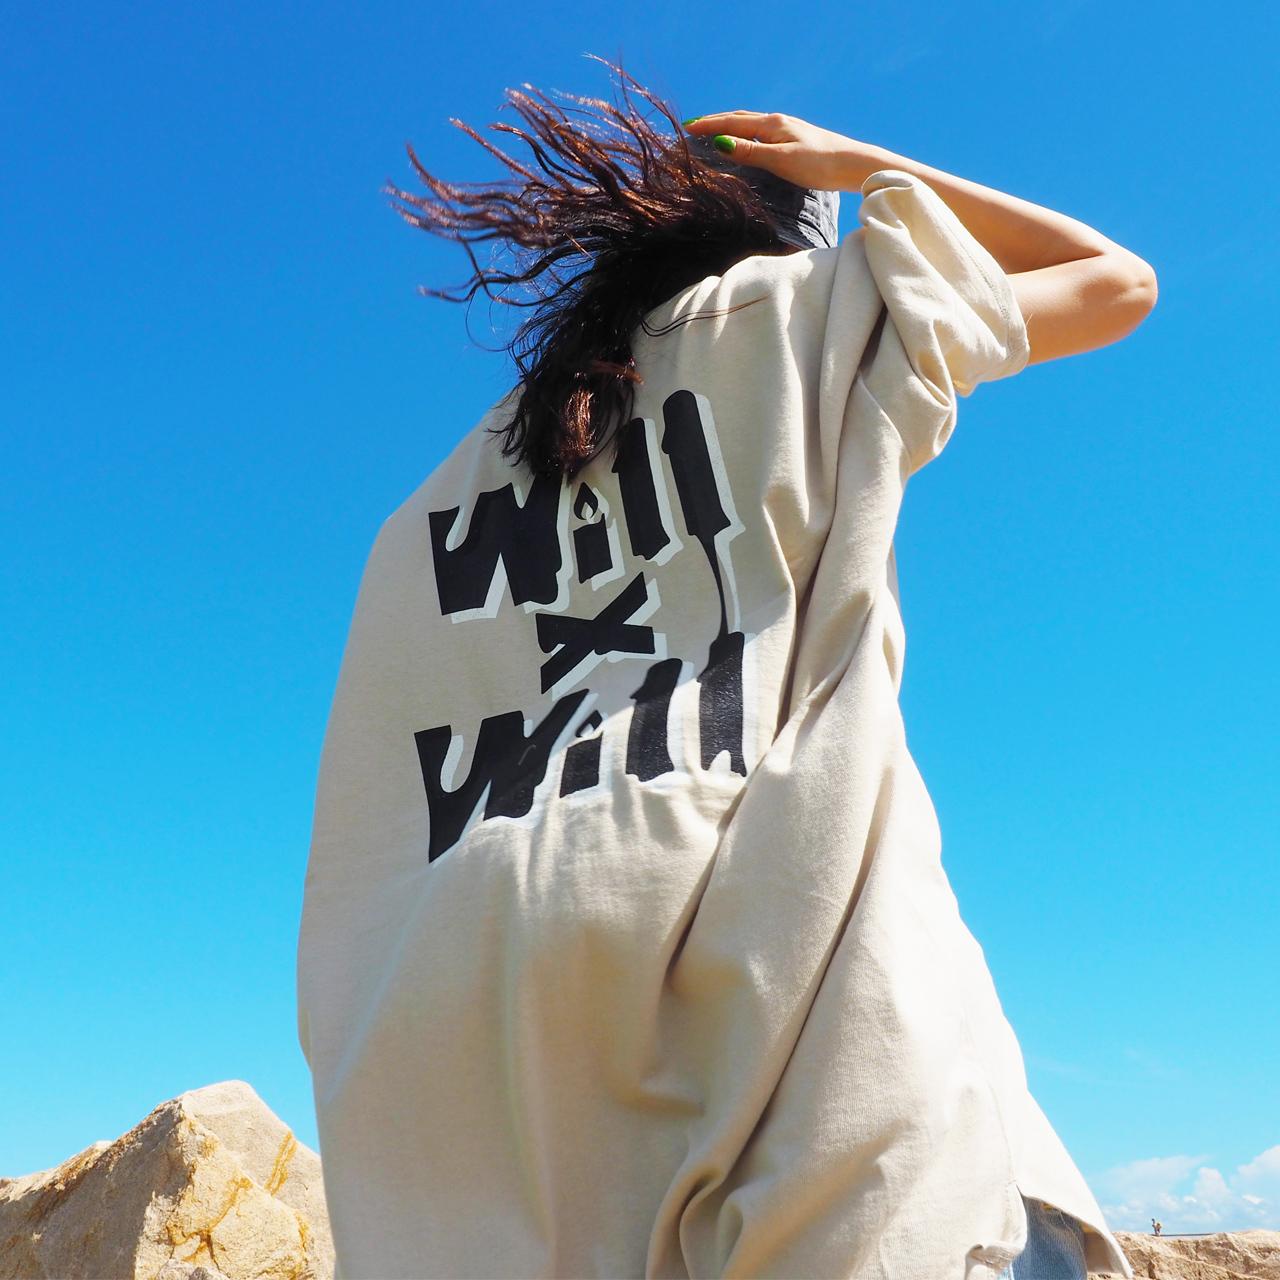 WillxWill Candle Light Big Silhouette T-shirts stone